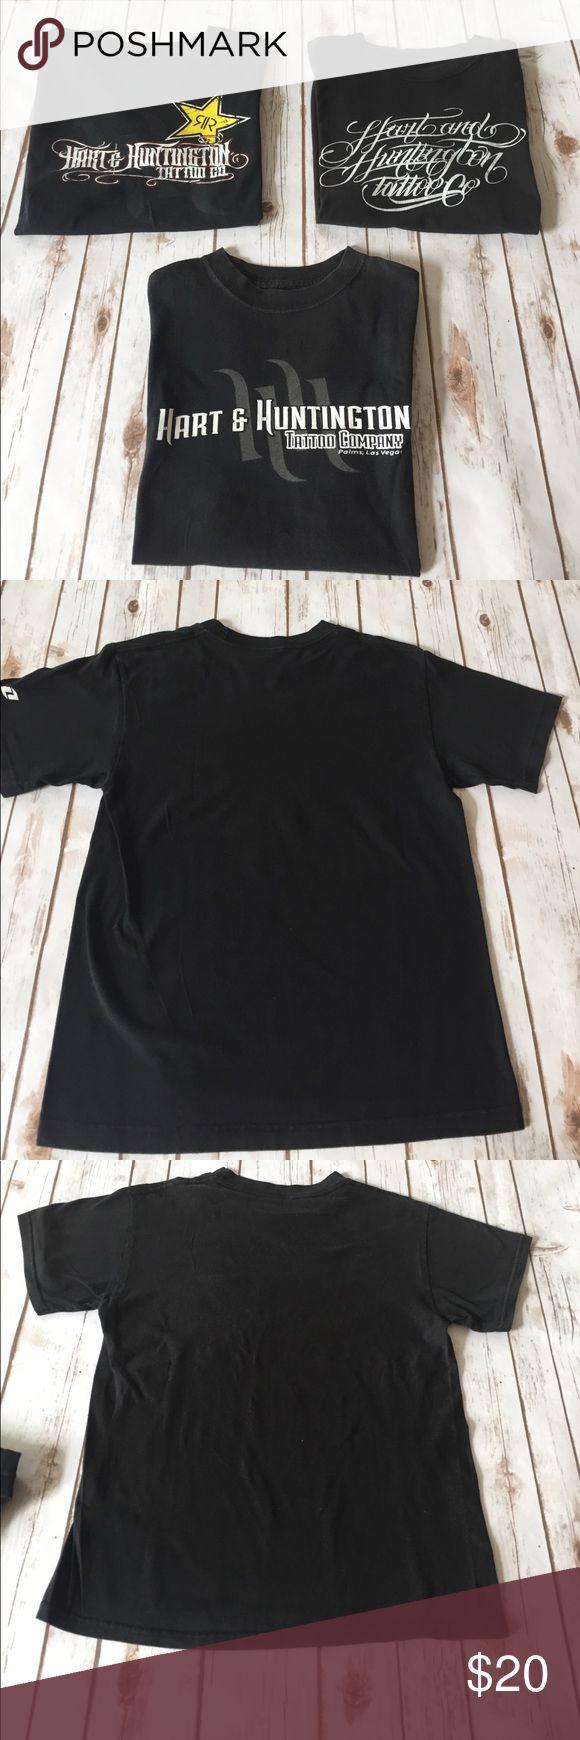 HART & HUNTINGTON TATTOO T-SHIRT BUNDLE Hart & Huntington Tattoo Las Vegas, 3 black t-shirts in very good condition. No holes or stains. Hart & Huntington Shirts Tees - Short Sleeve